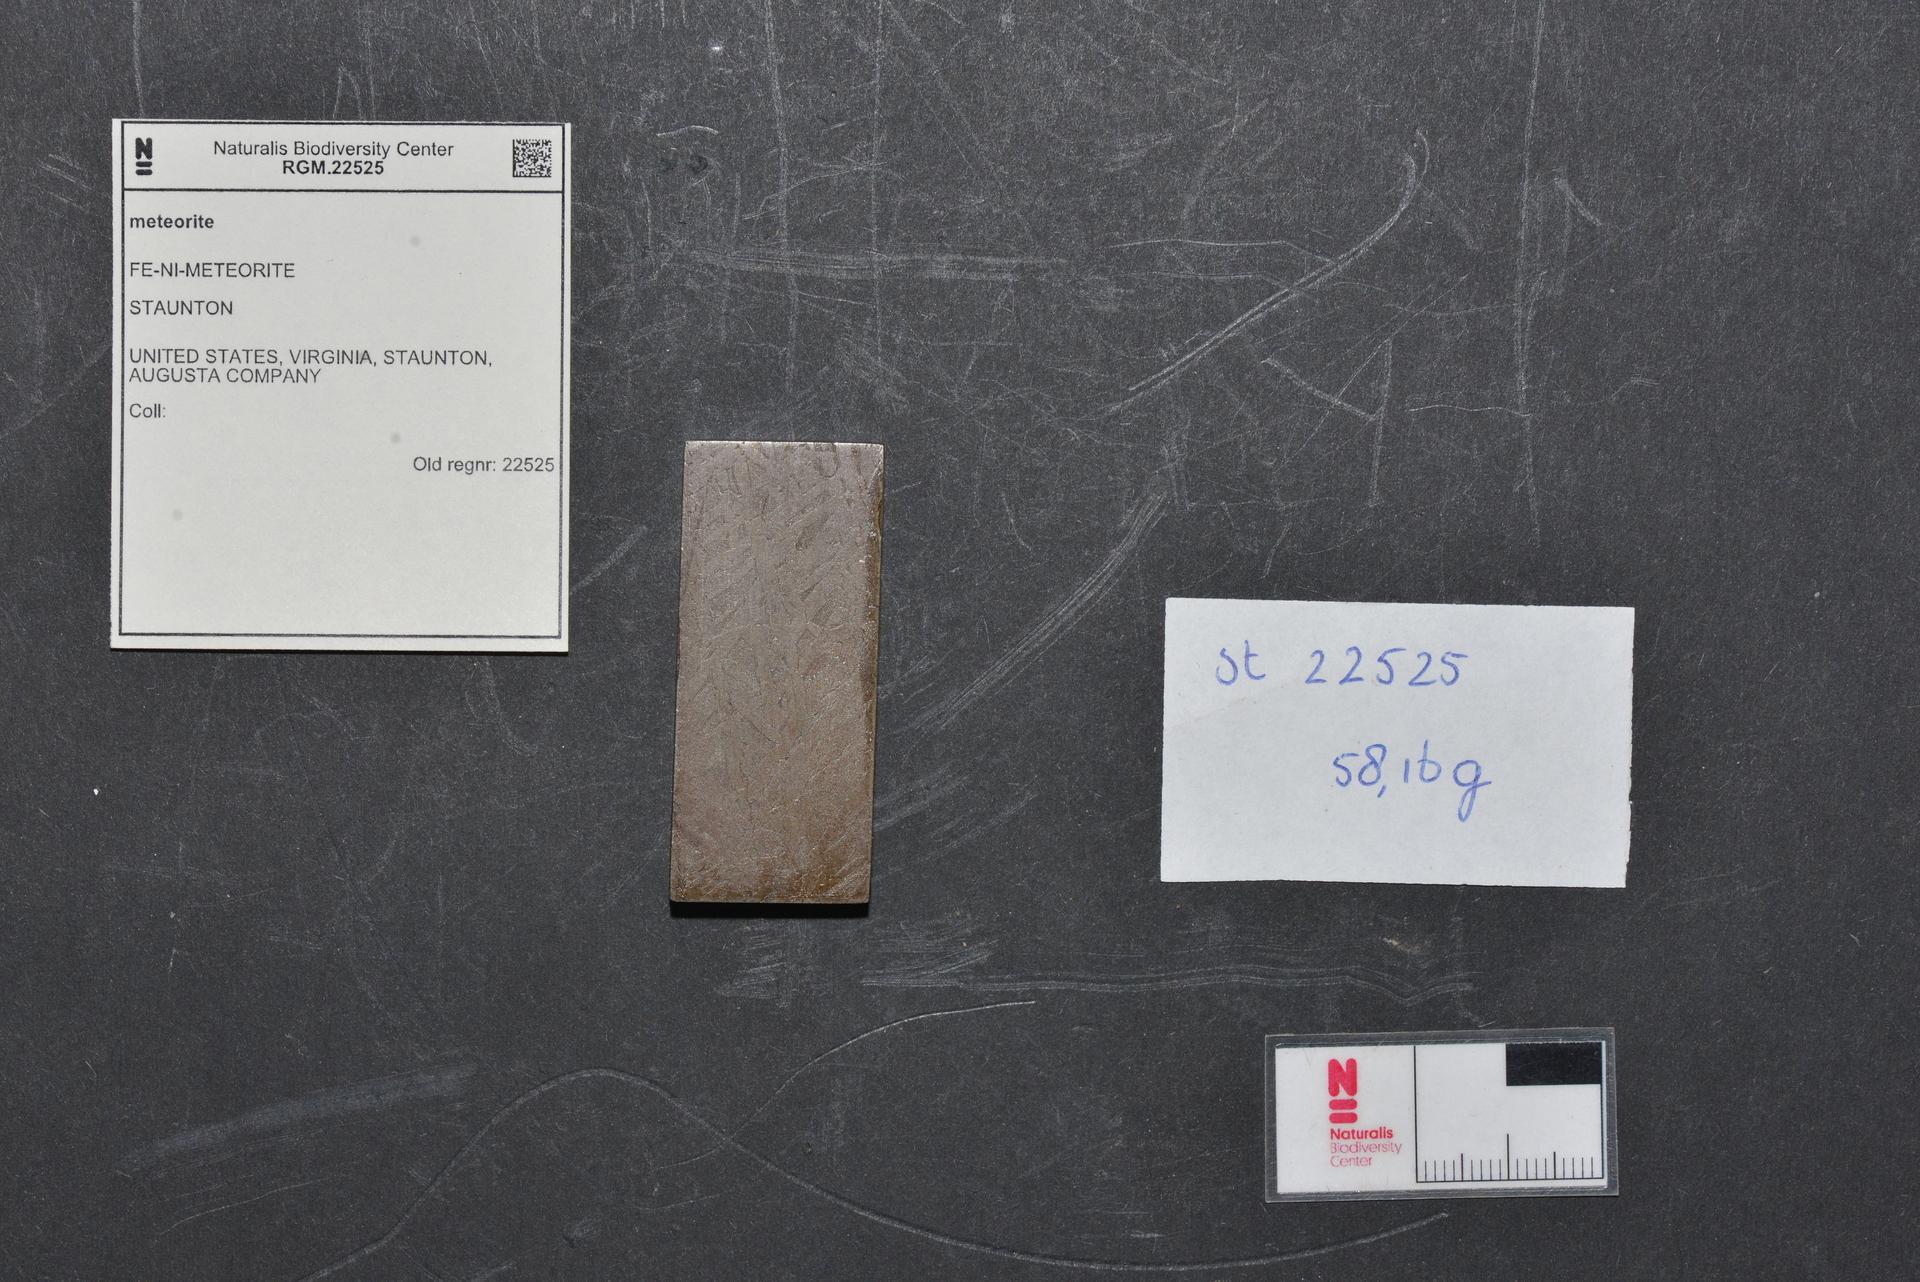 RGM.22525 | Iron, IIIE